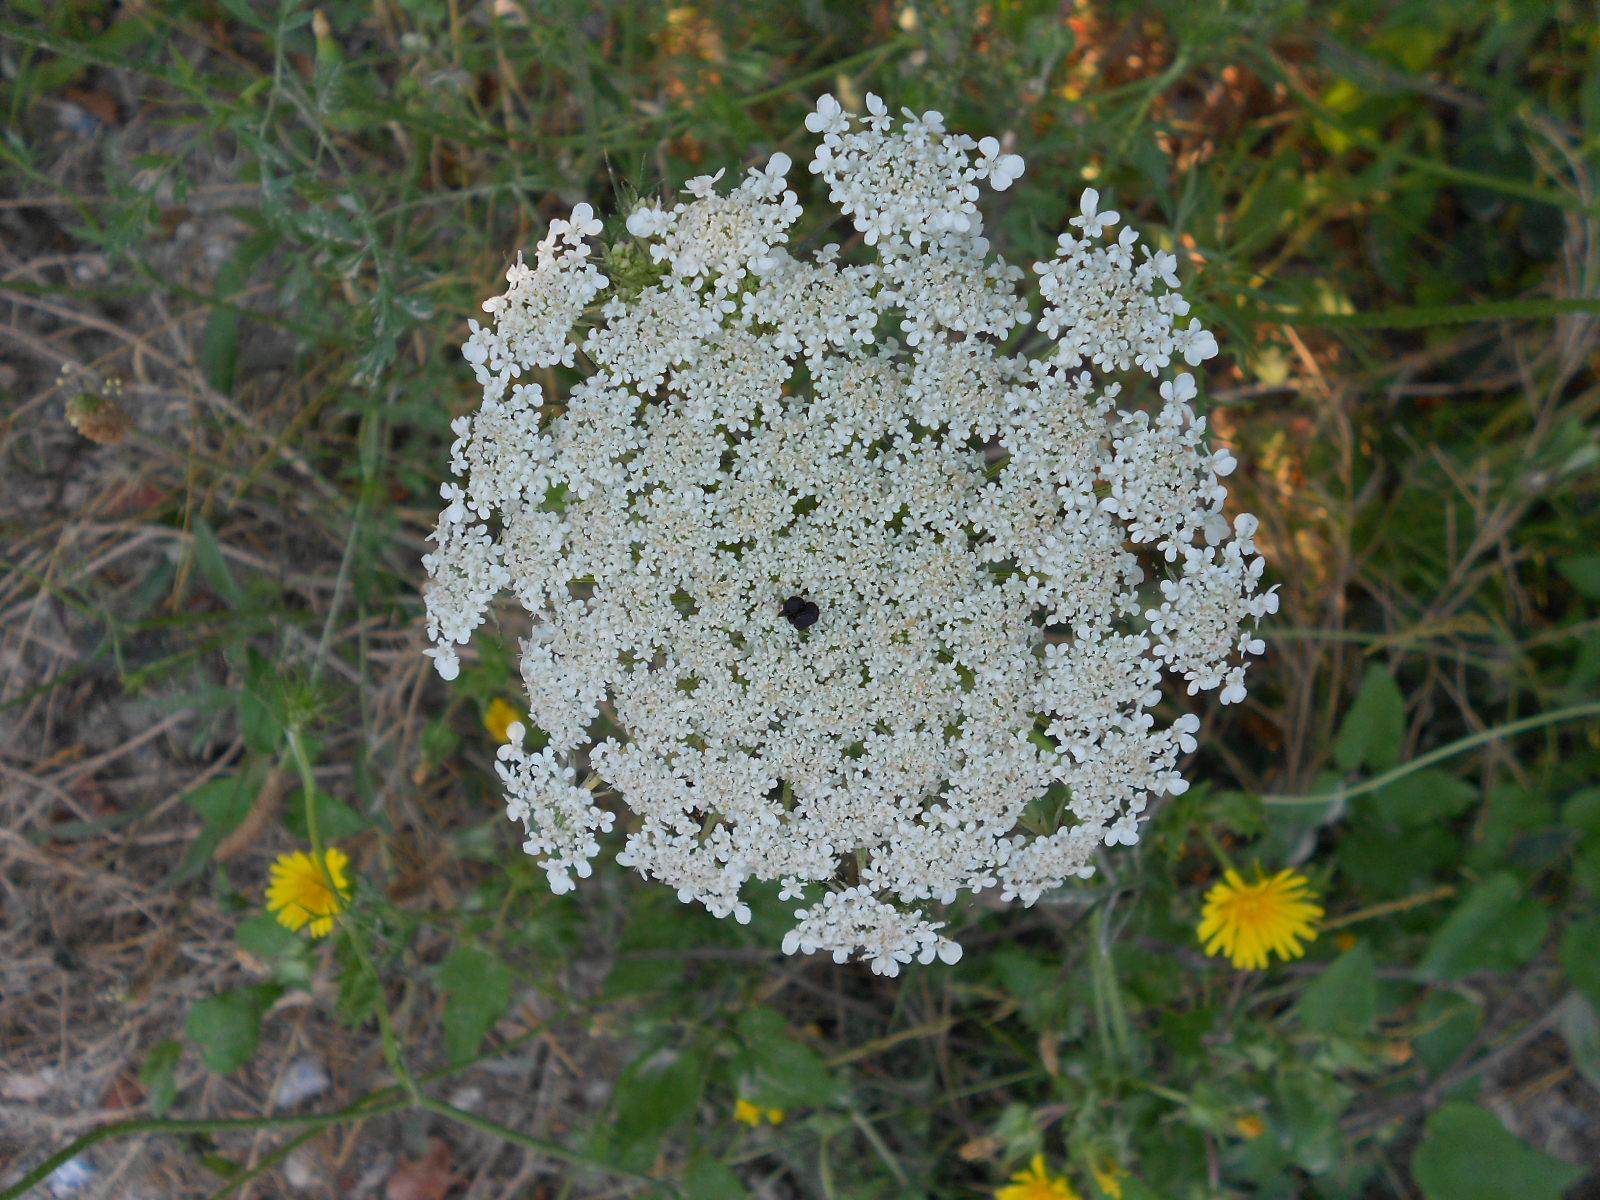 Fiori Bianchi Ottobre.Arbusti E Piante Carota Selvatica Daucus Carota